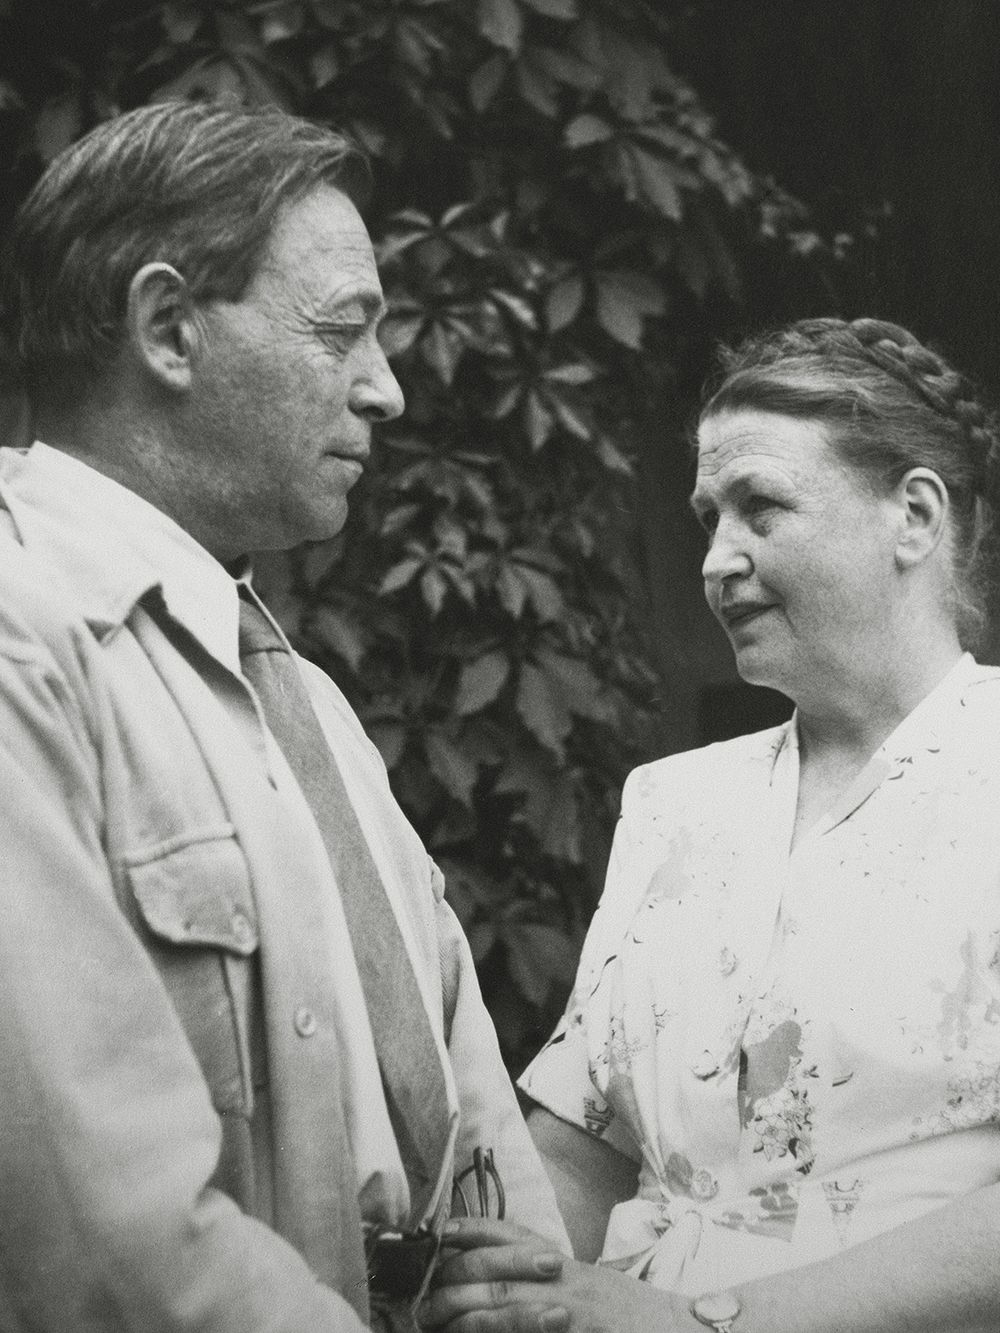 Alvar and Aino Aalto